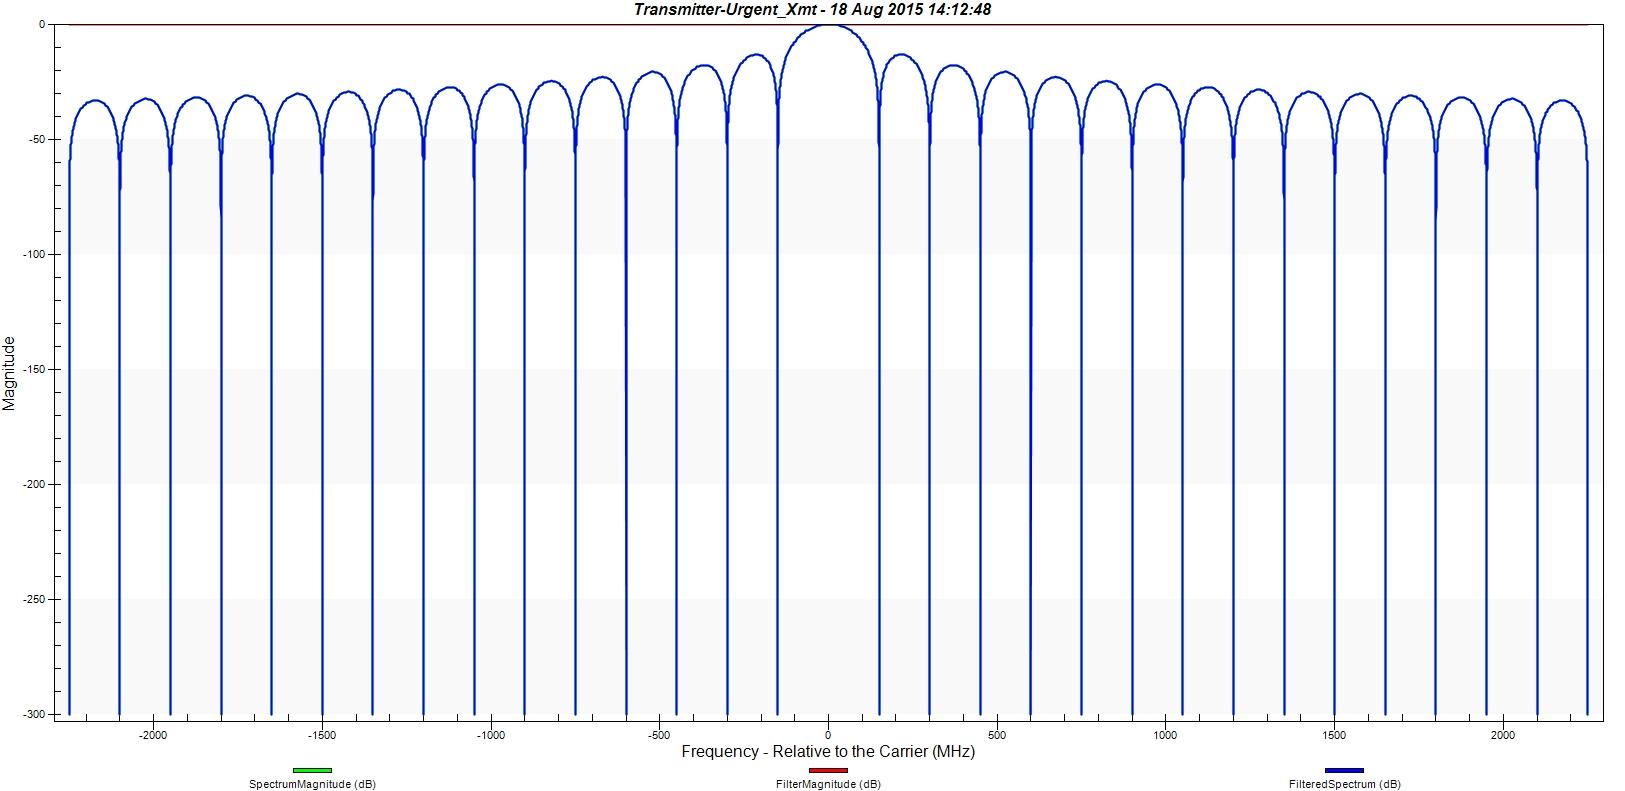 STK - STK Communications Filtering